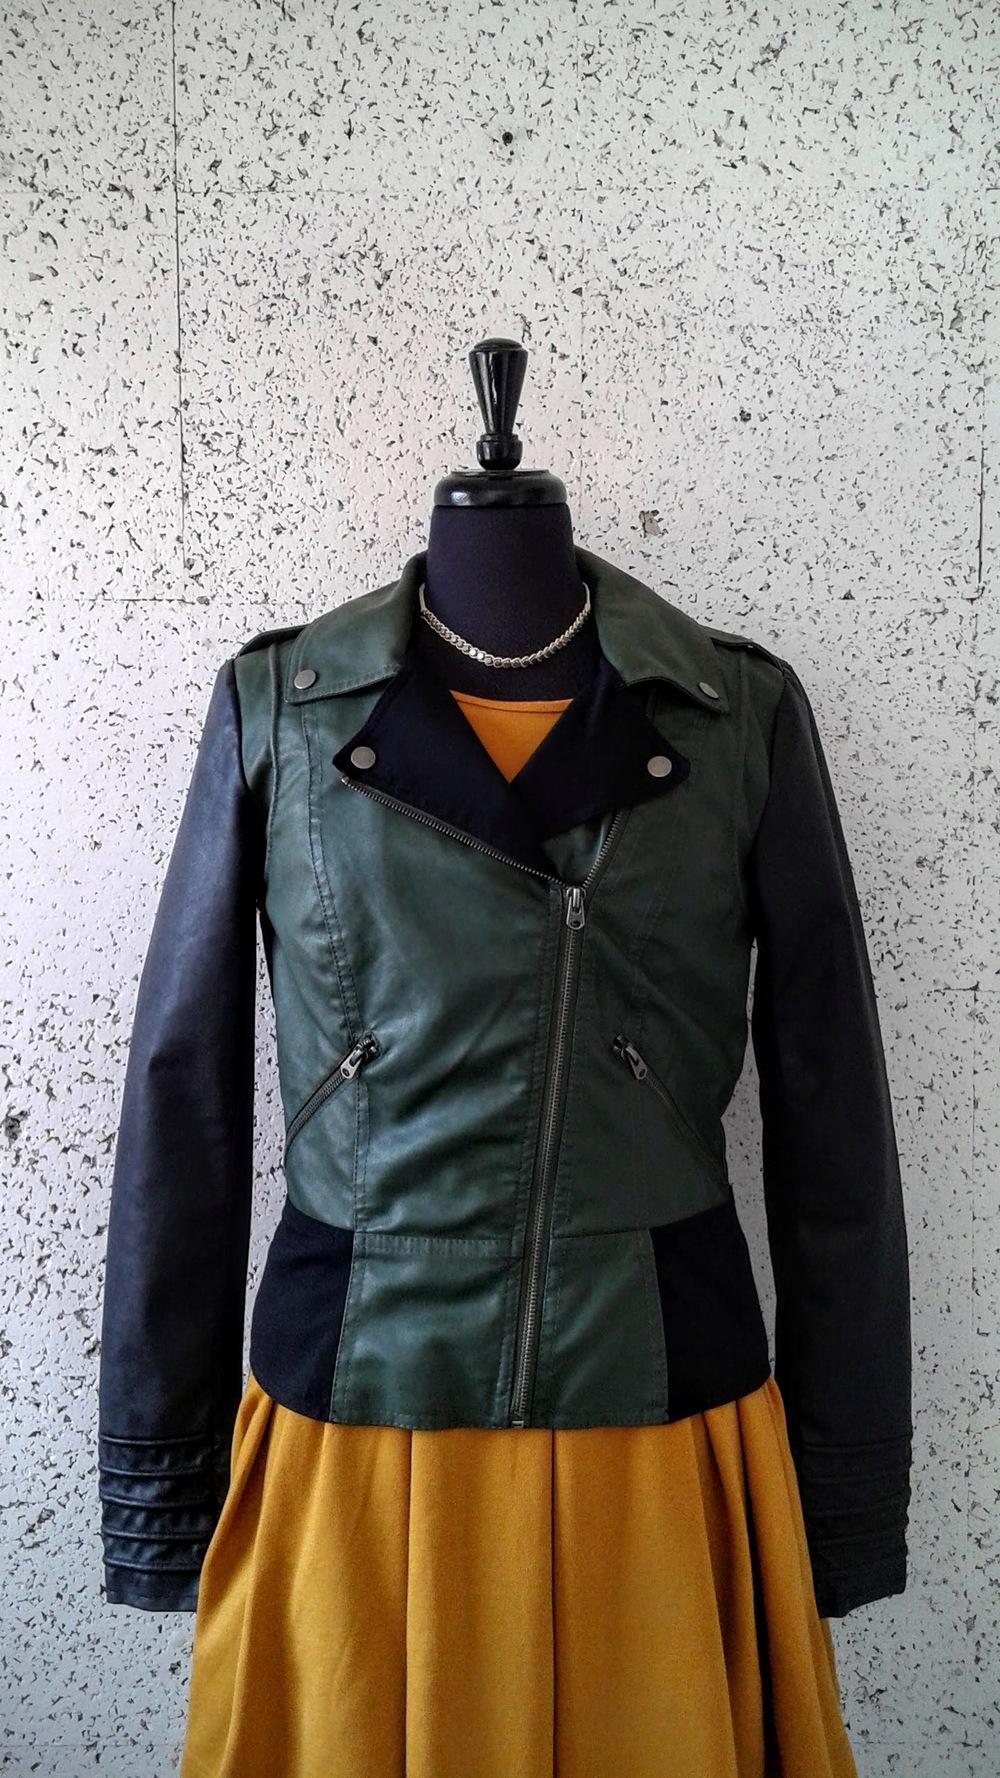 Vero Moda motto jacket; Size M, $38